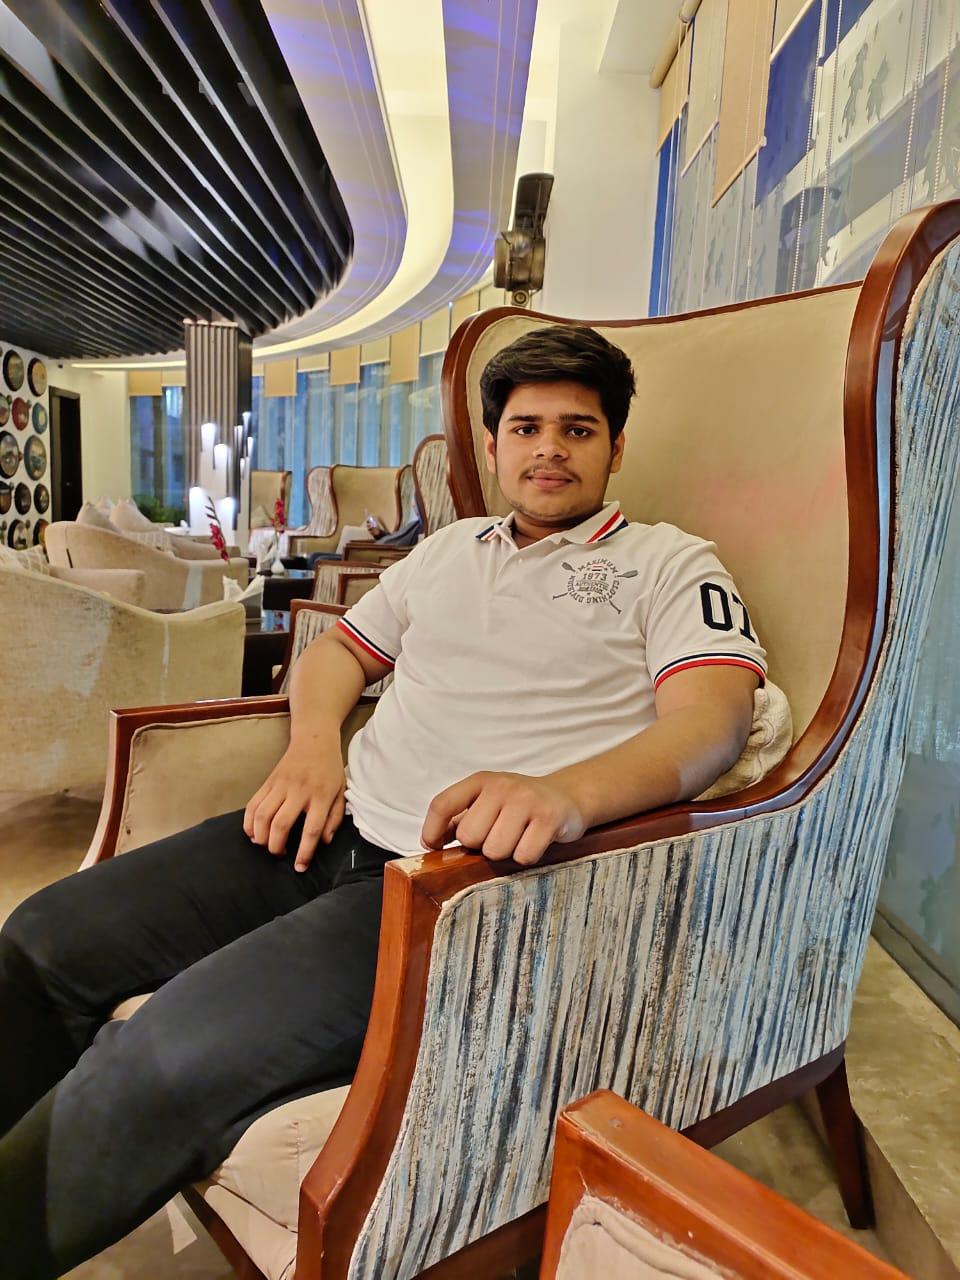 Kumar Aryan, a 16 year old visionary boy ruling Digital Market